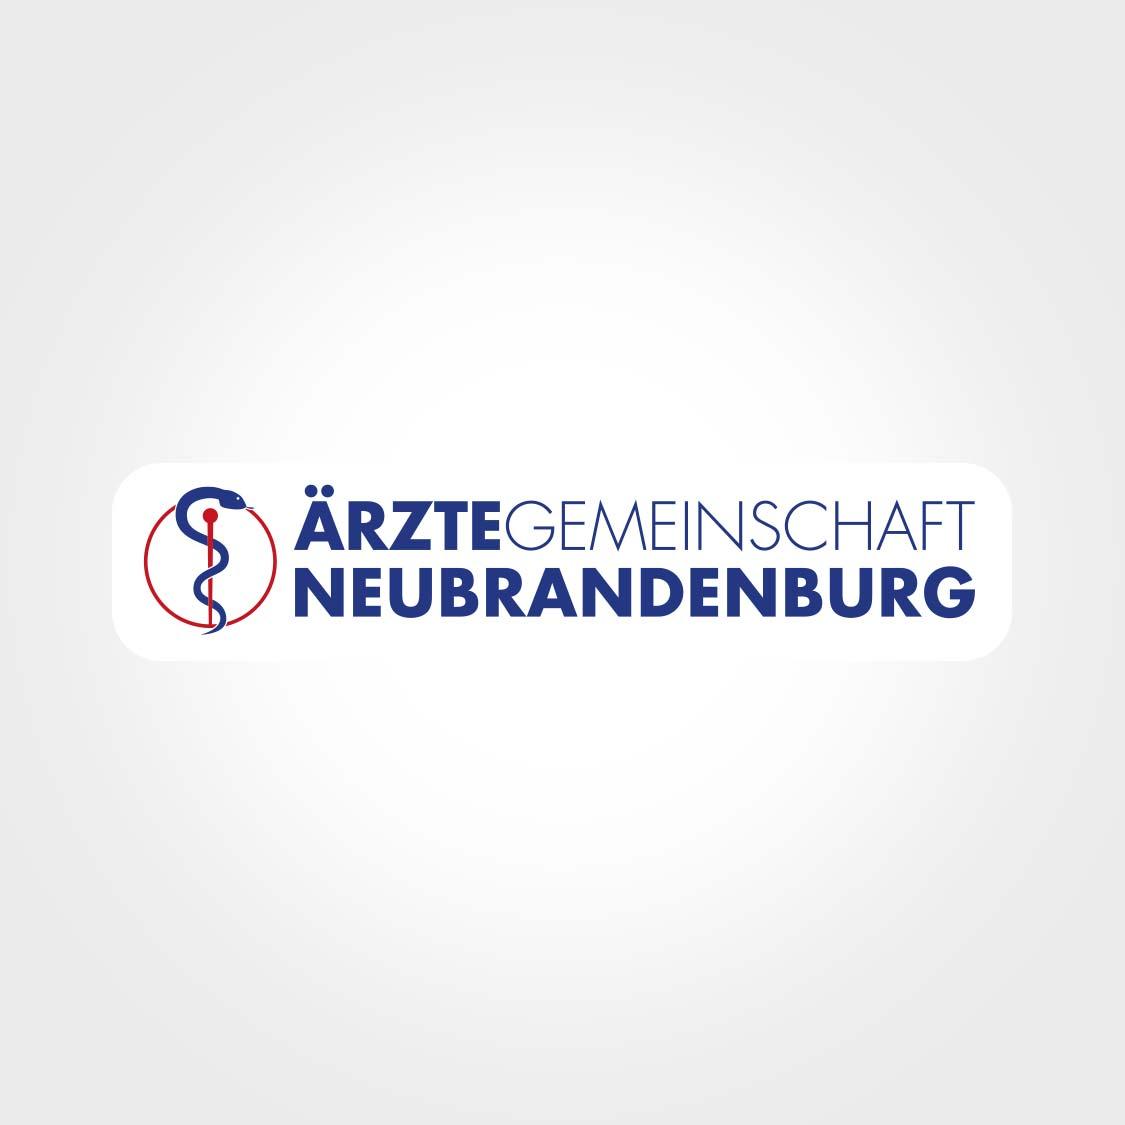 logo aerztegemeinschaft neubrandenburg 1125px